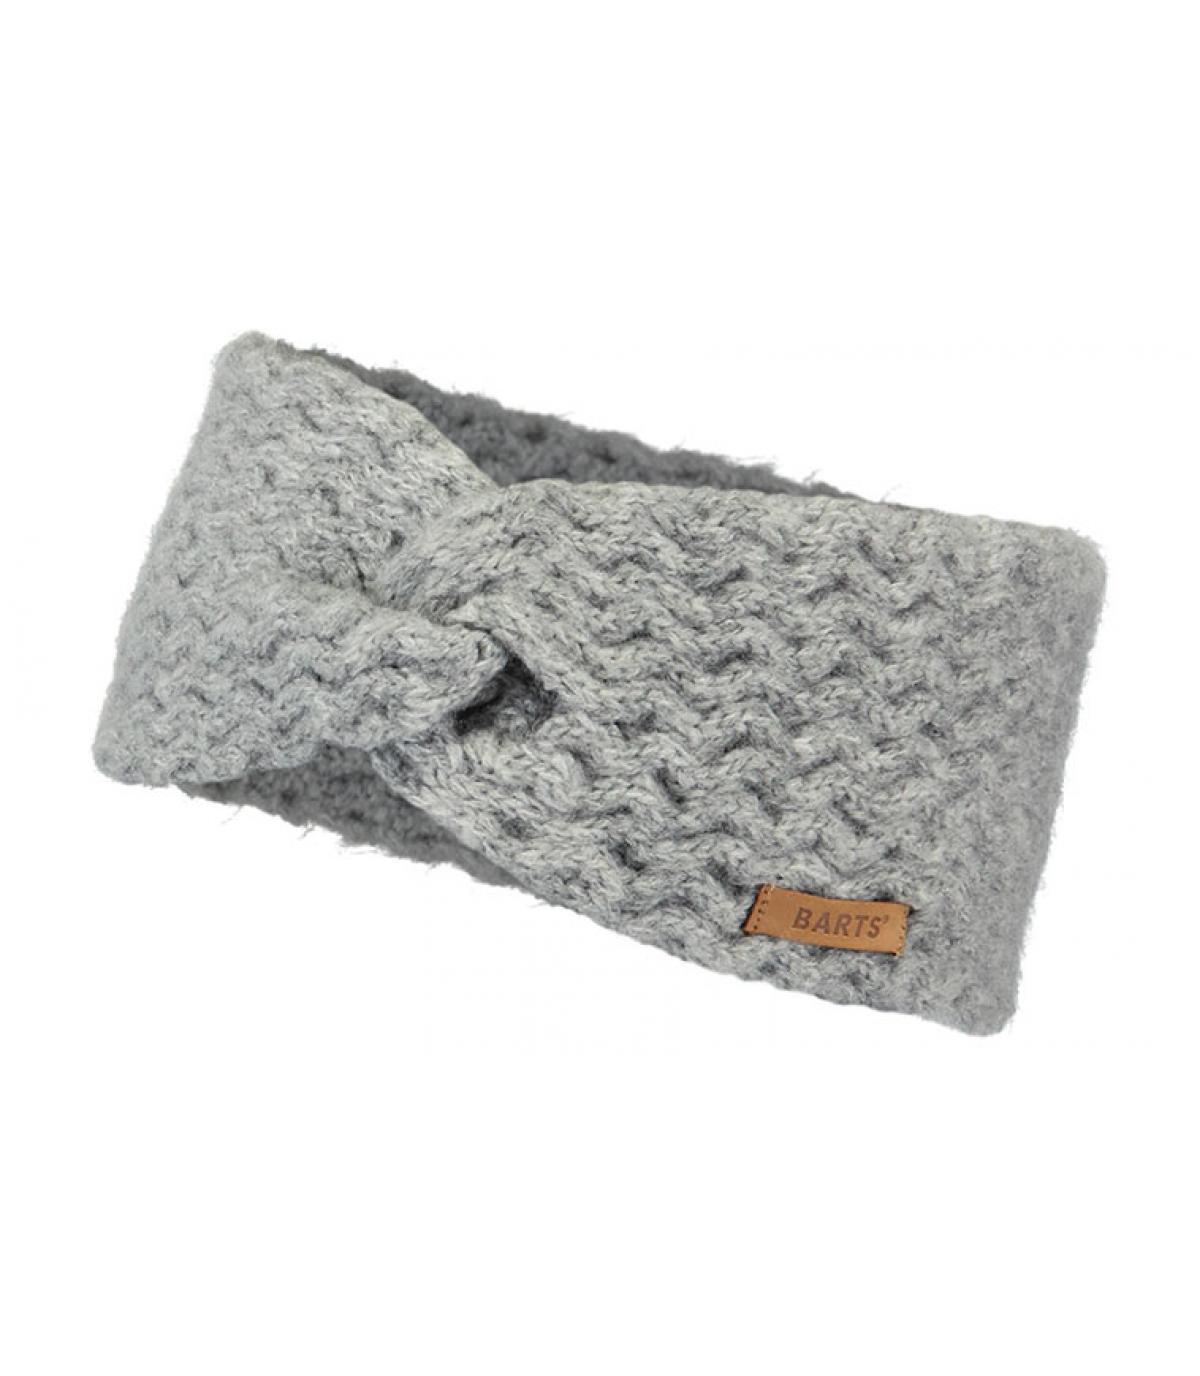 Details Kids Rozamond Headband heather grey - Abbildung 2